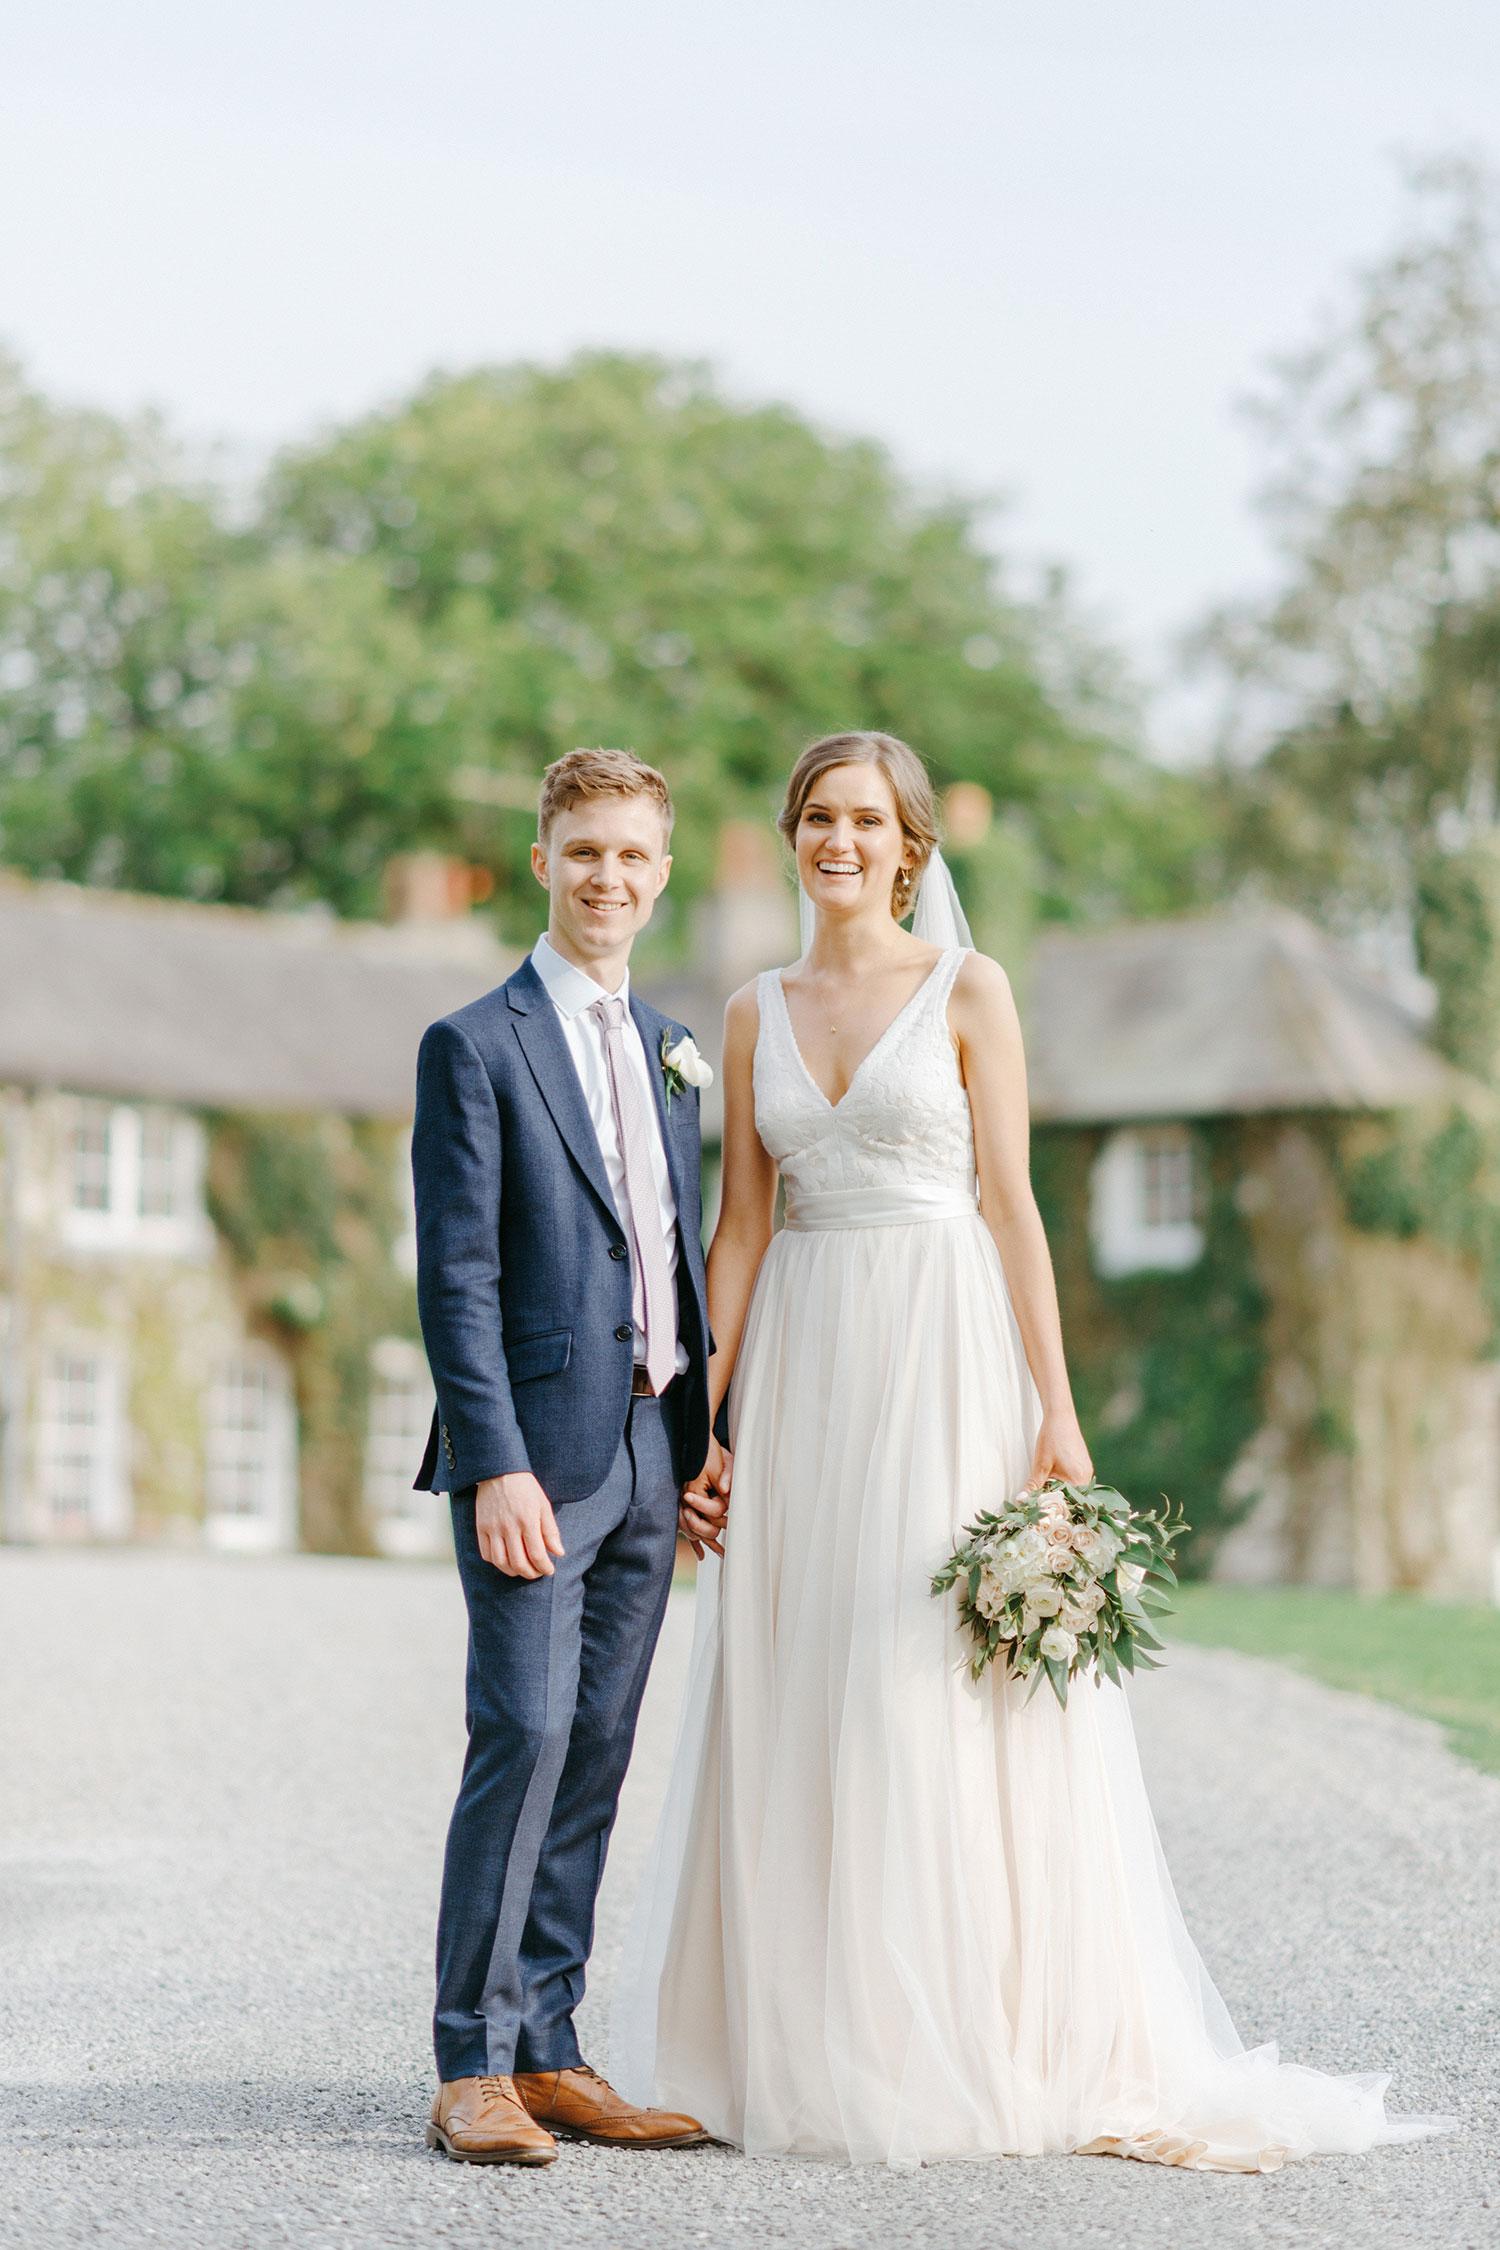 rathsallagh-house-wedding-photographer-0101_1179.jpg